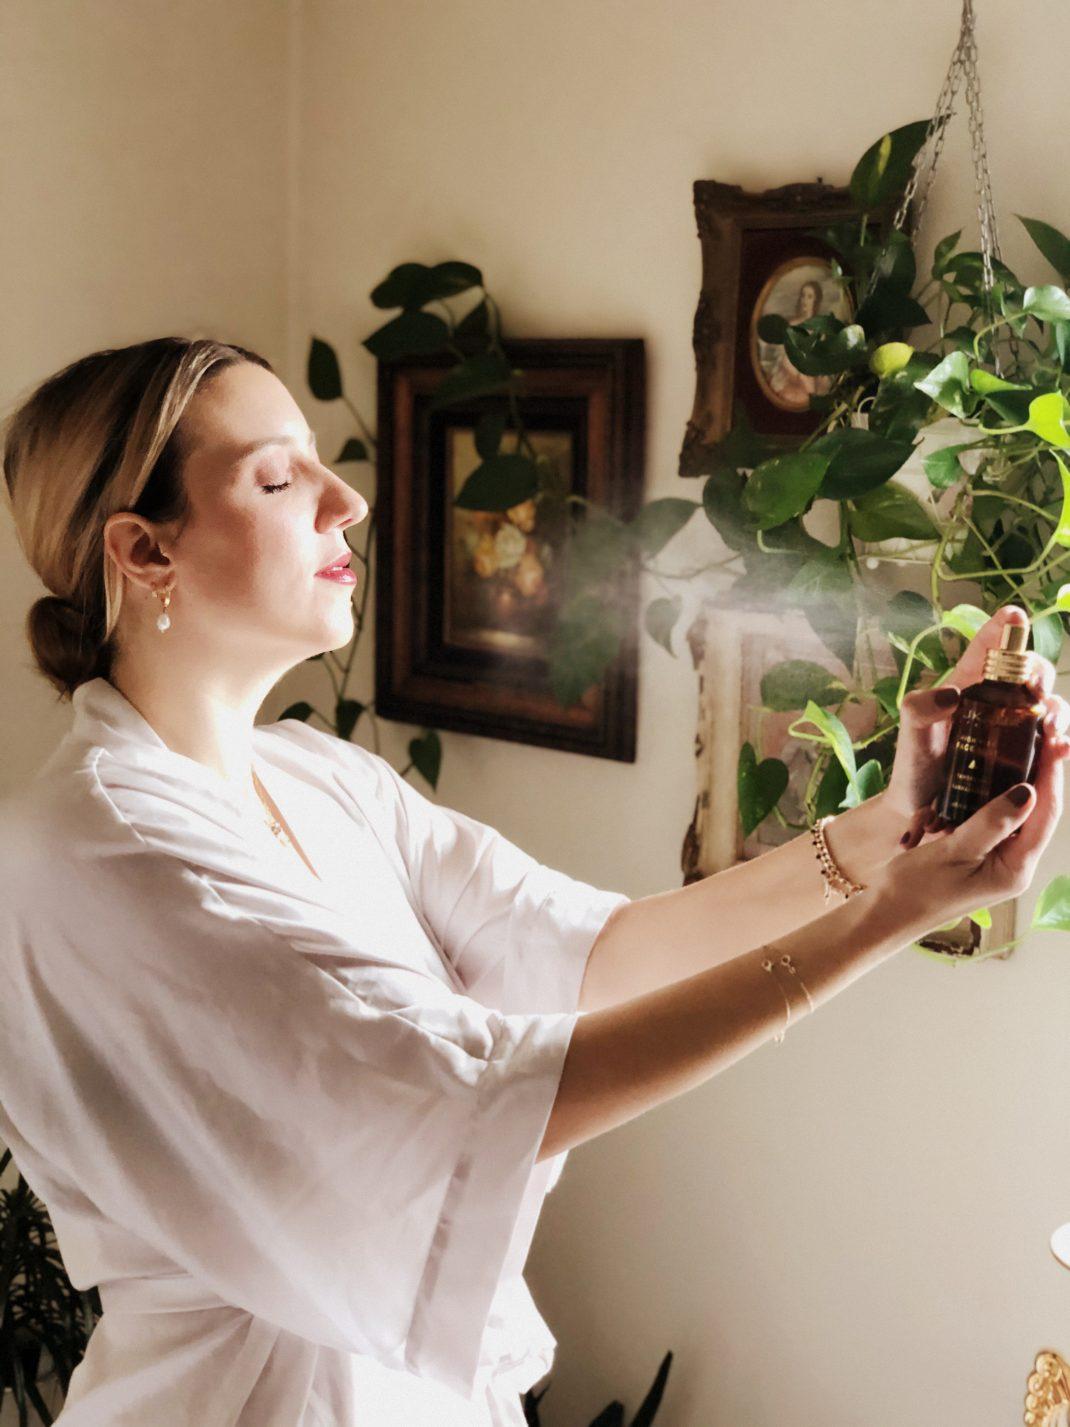 mukama botanica